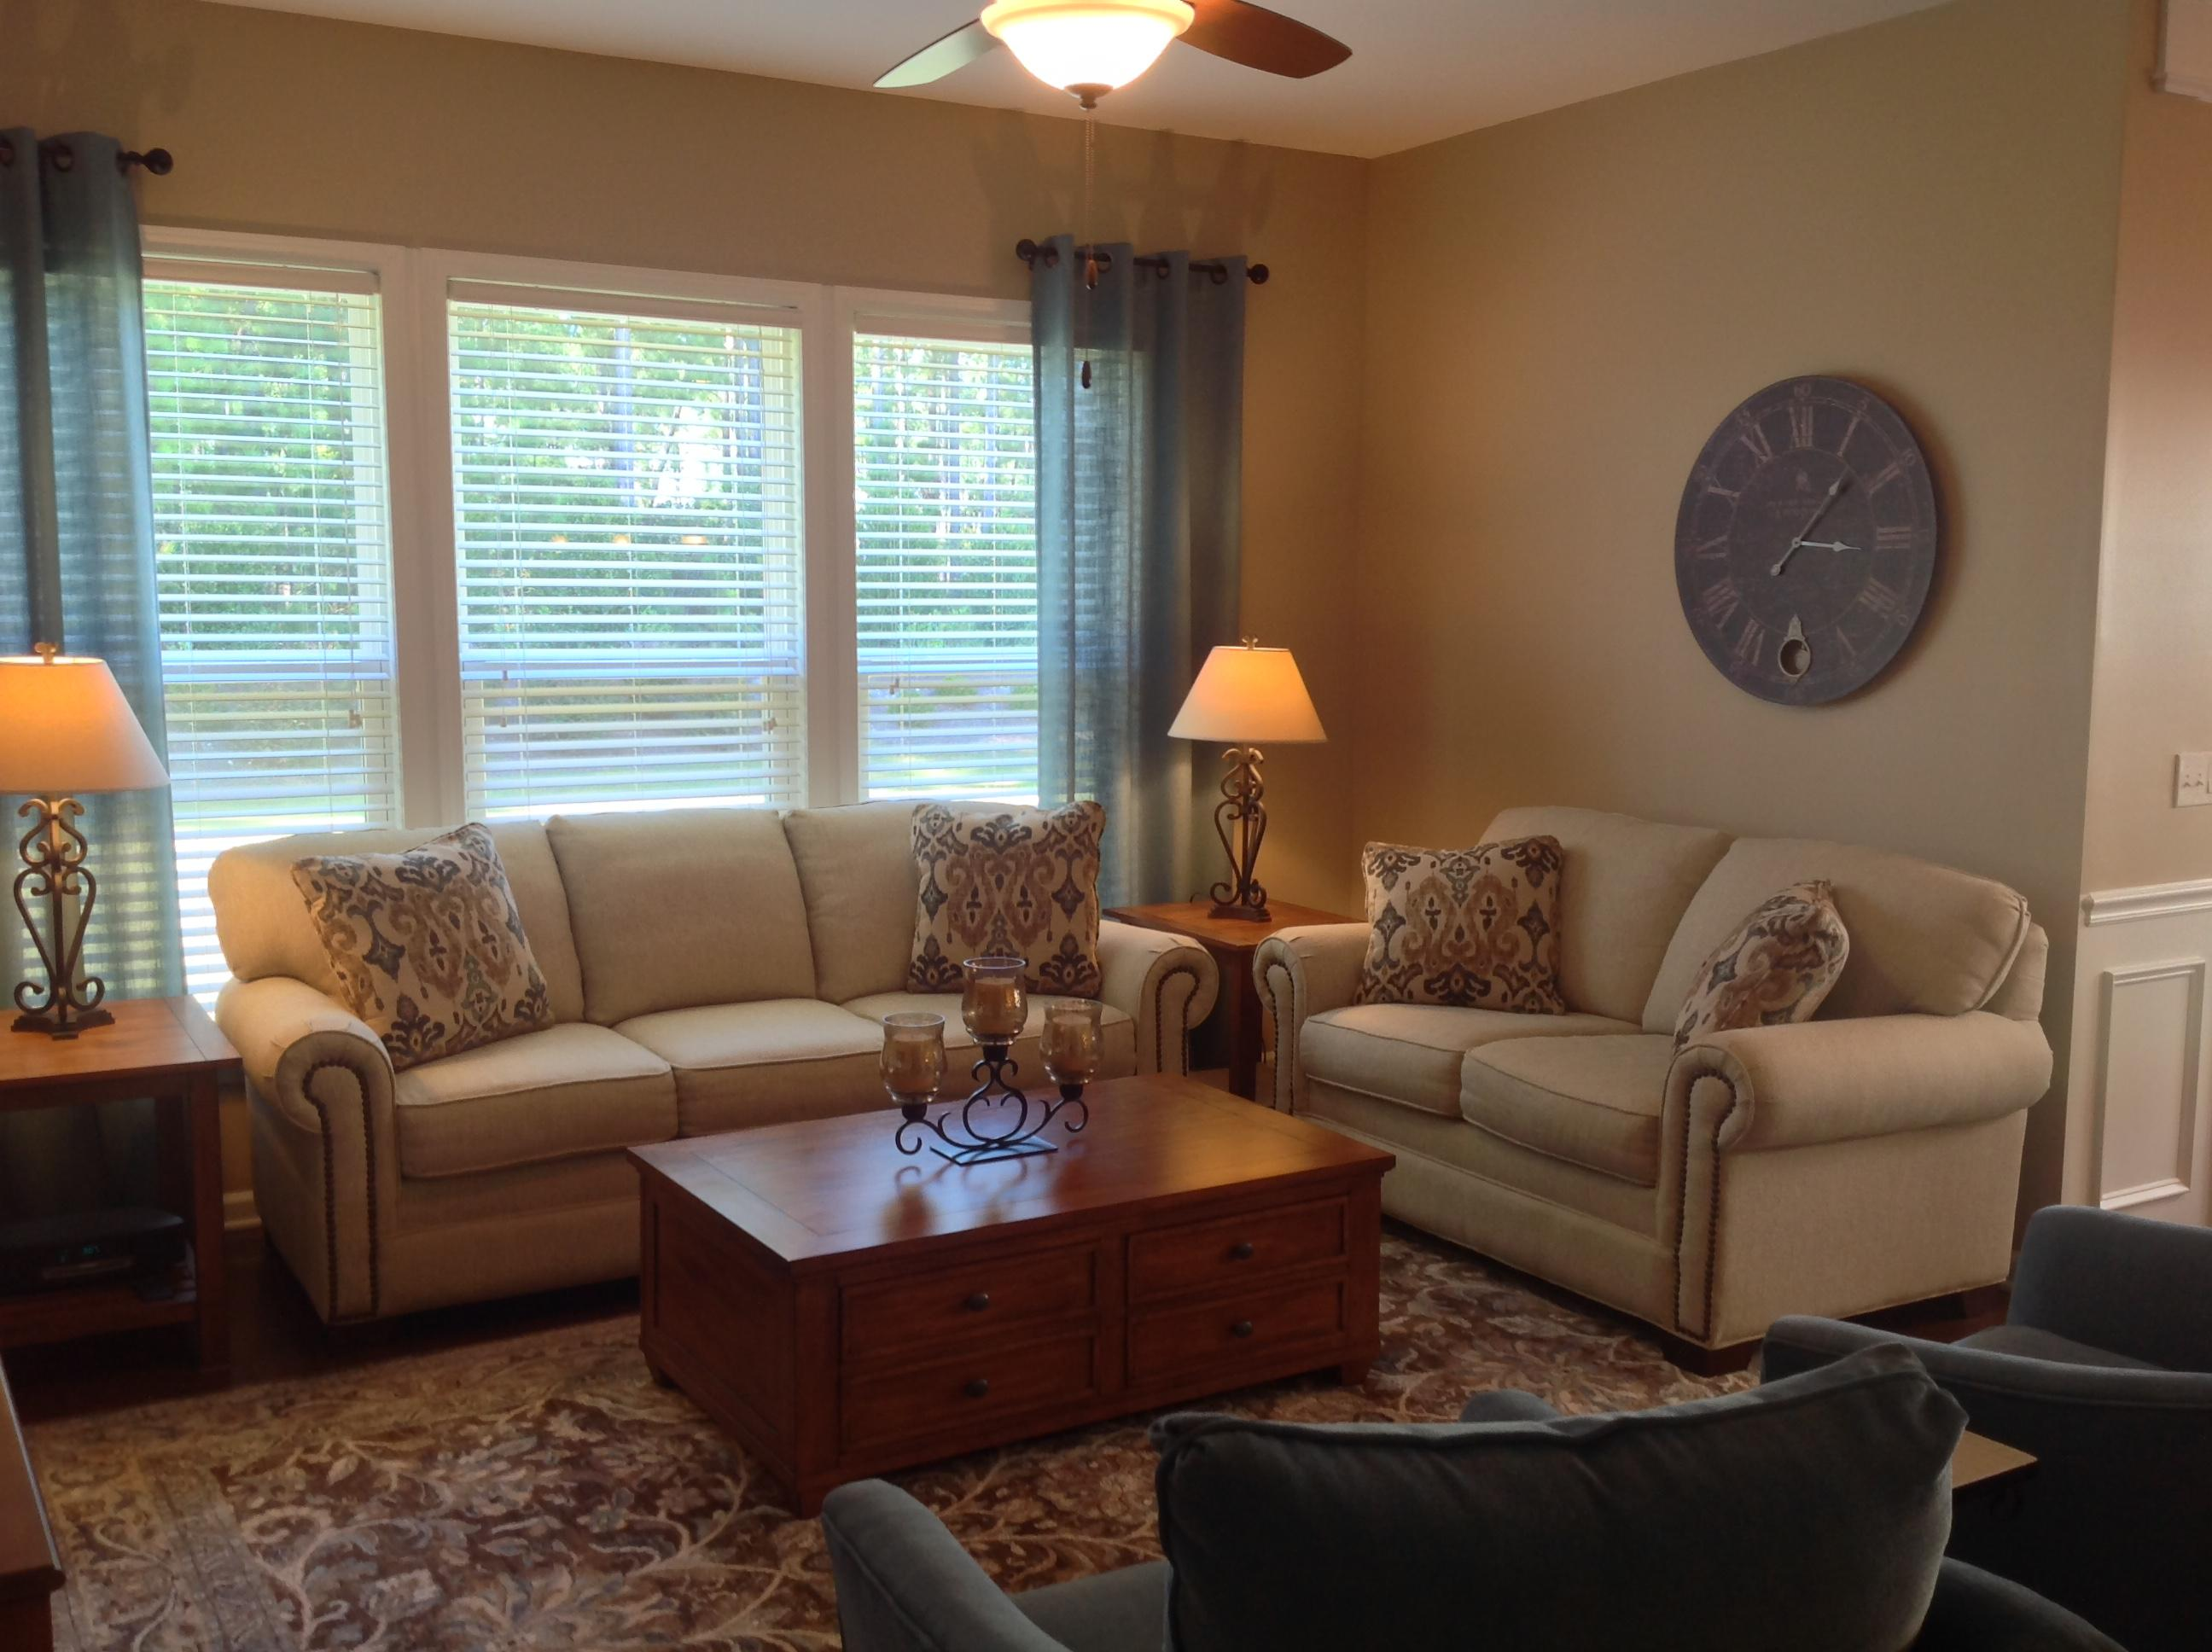 Cane Bay Plantation Homes For Sale - 547 Eastern Isle, Summerville, SC - 8